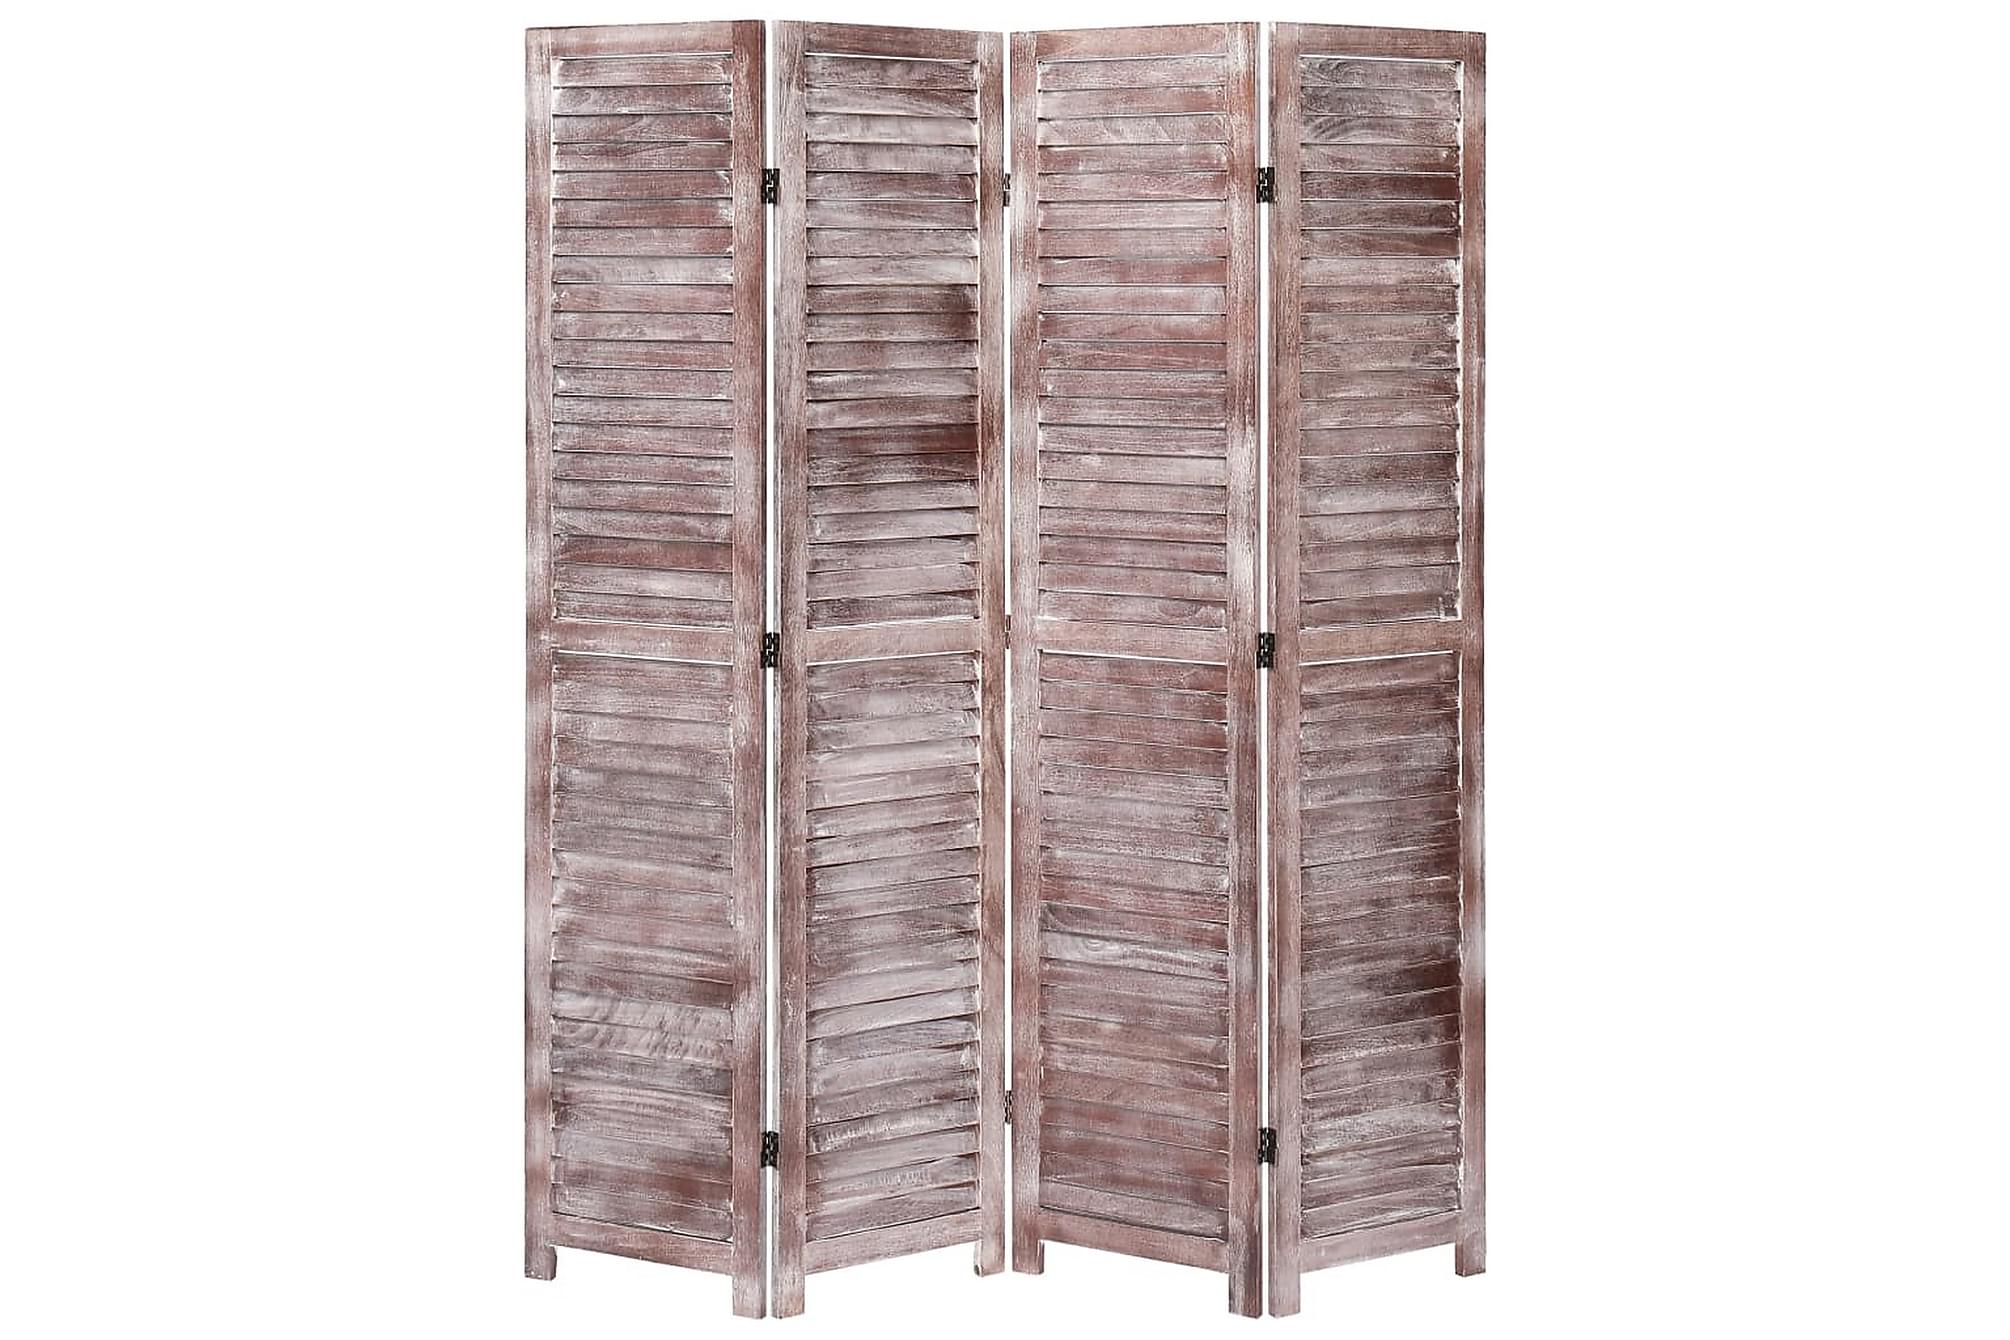 Rumsavdelare 4 paneler brun 140×165 cm trä